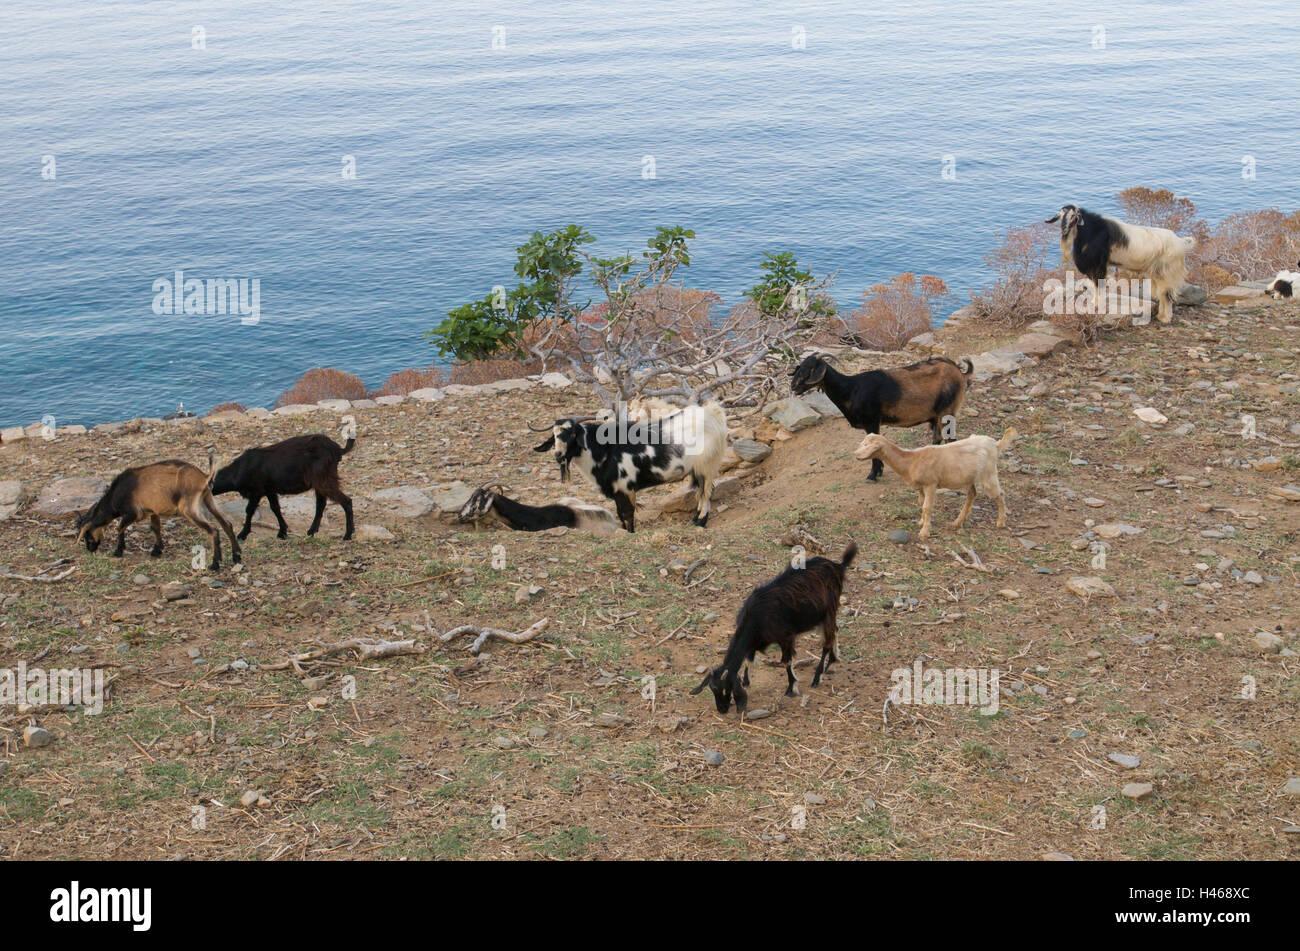 Herd of goats, coast, sea, island Sifnos, the Cyclades, Greece, - Stock Image